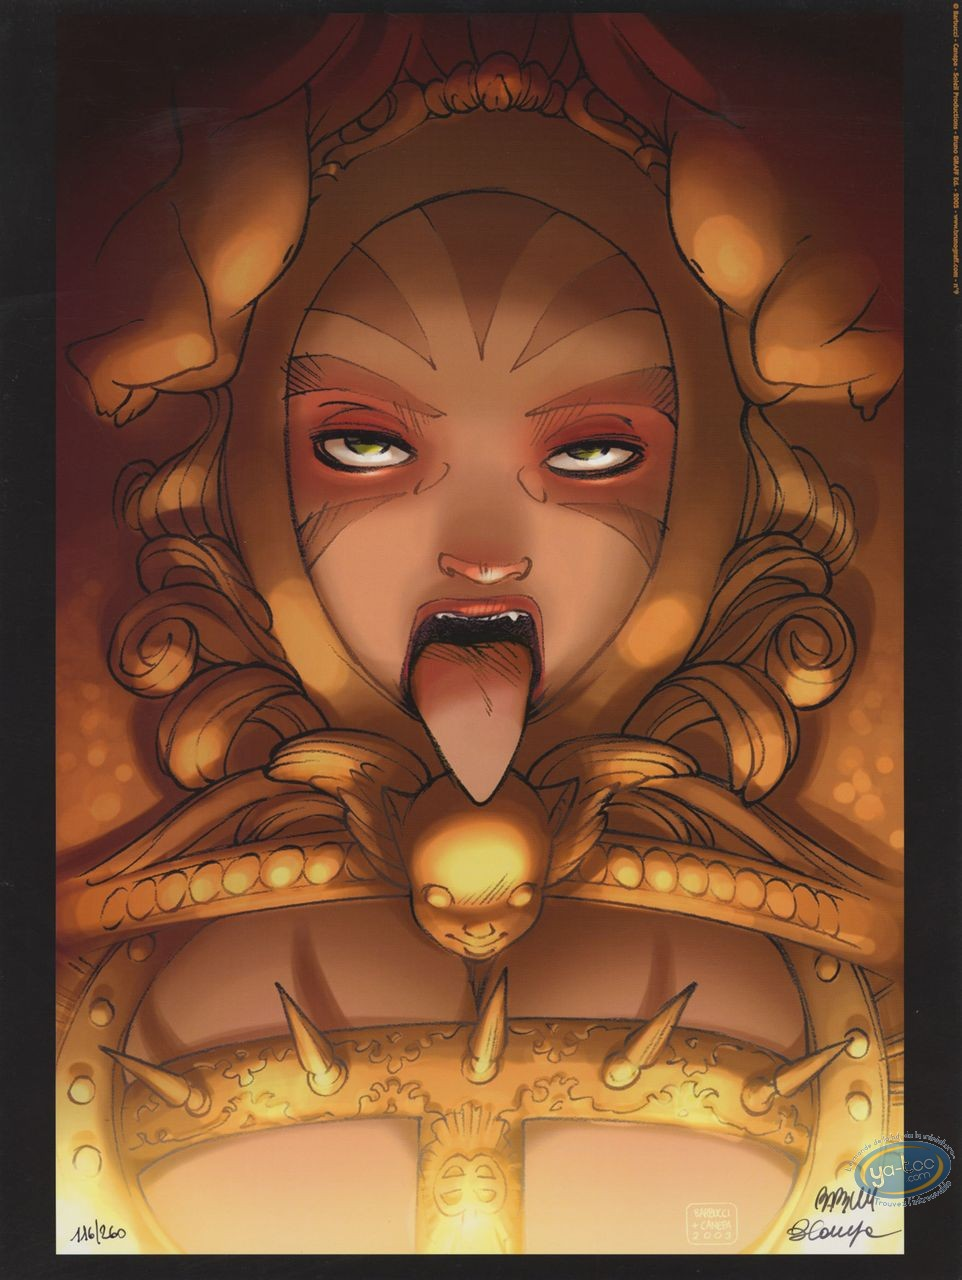 Offset Print, Sky Doll : Ludovique's tongue